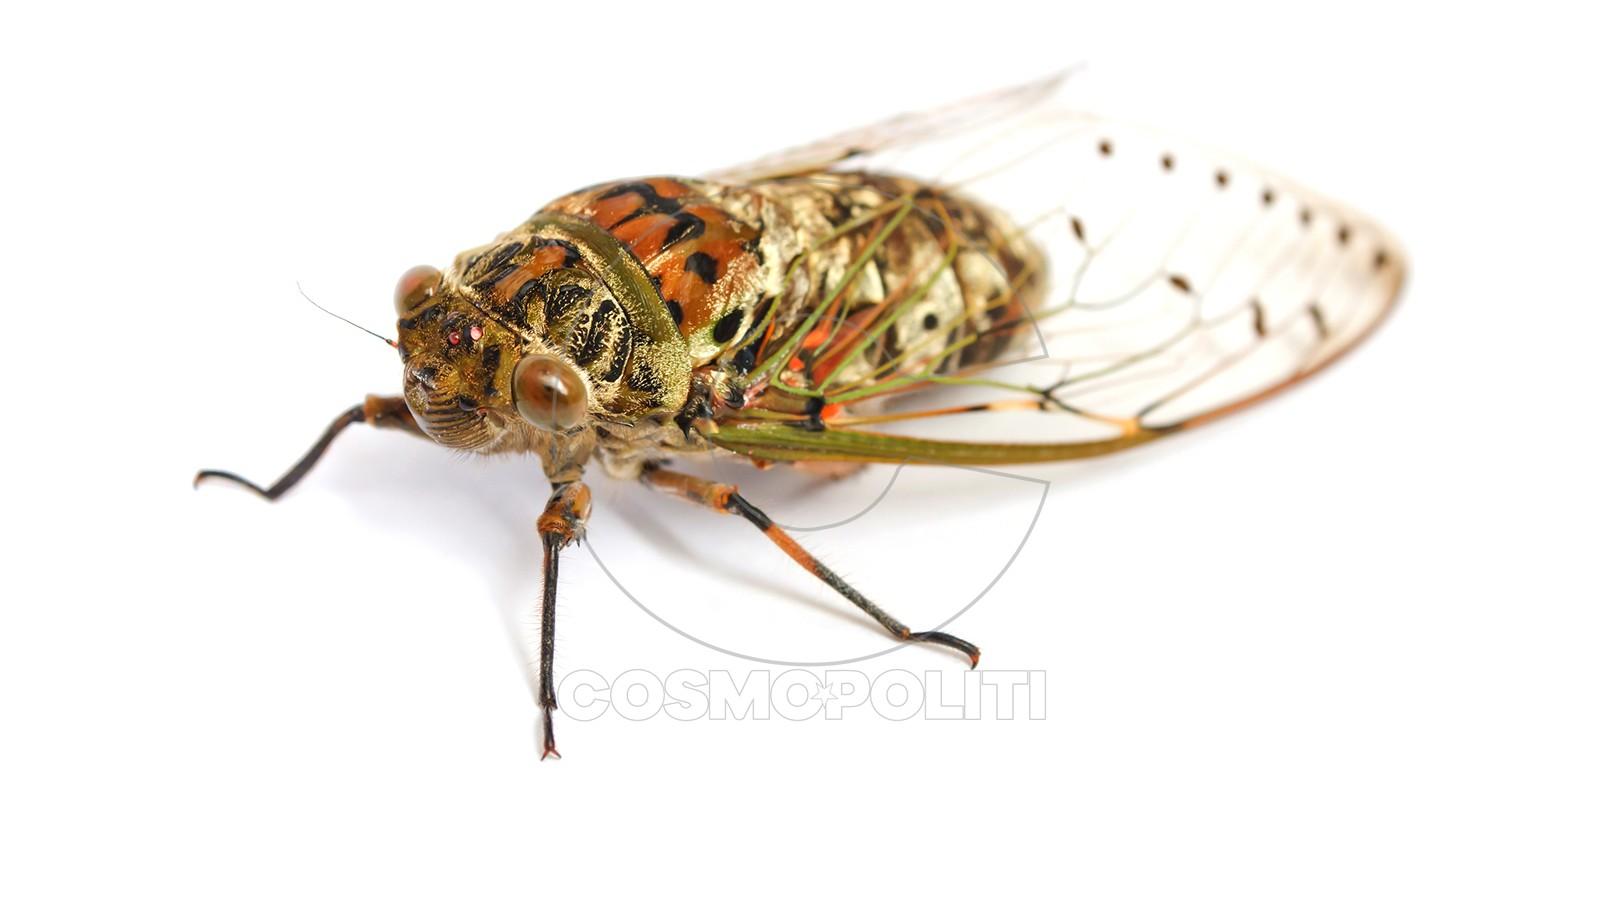 cicada-white-background